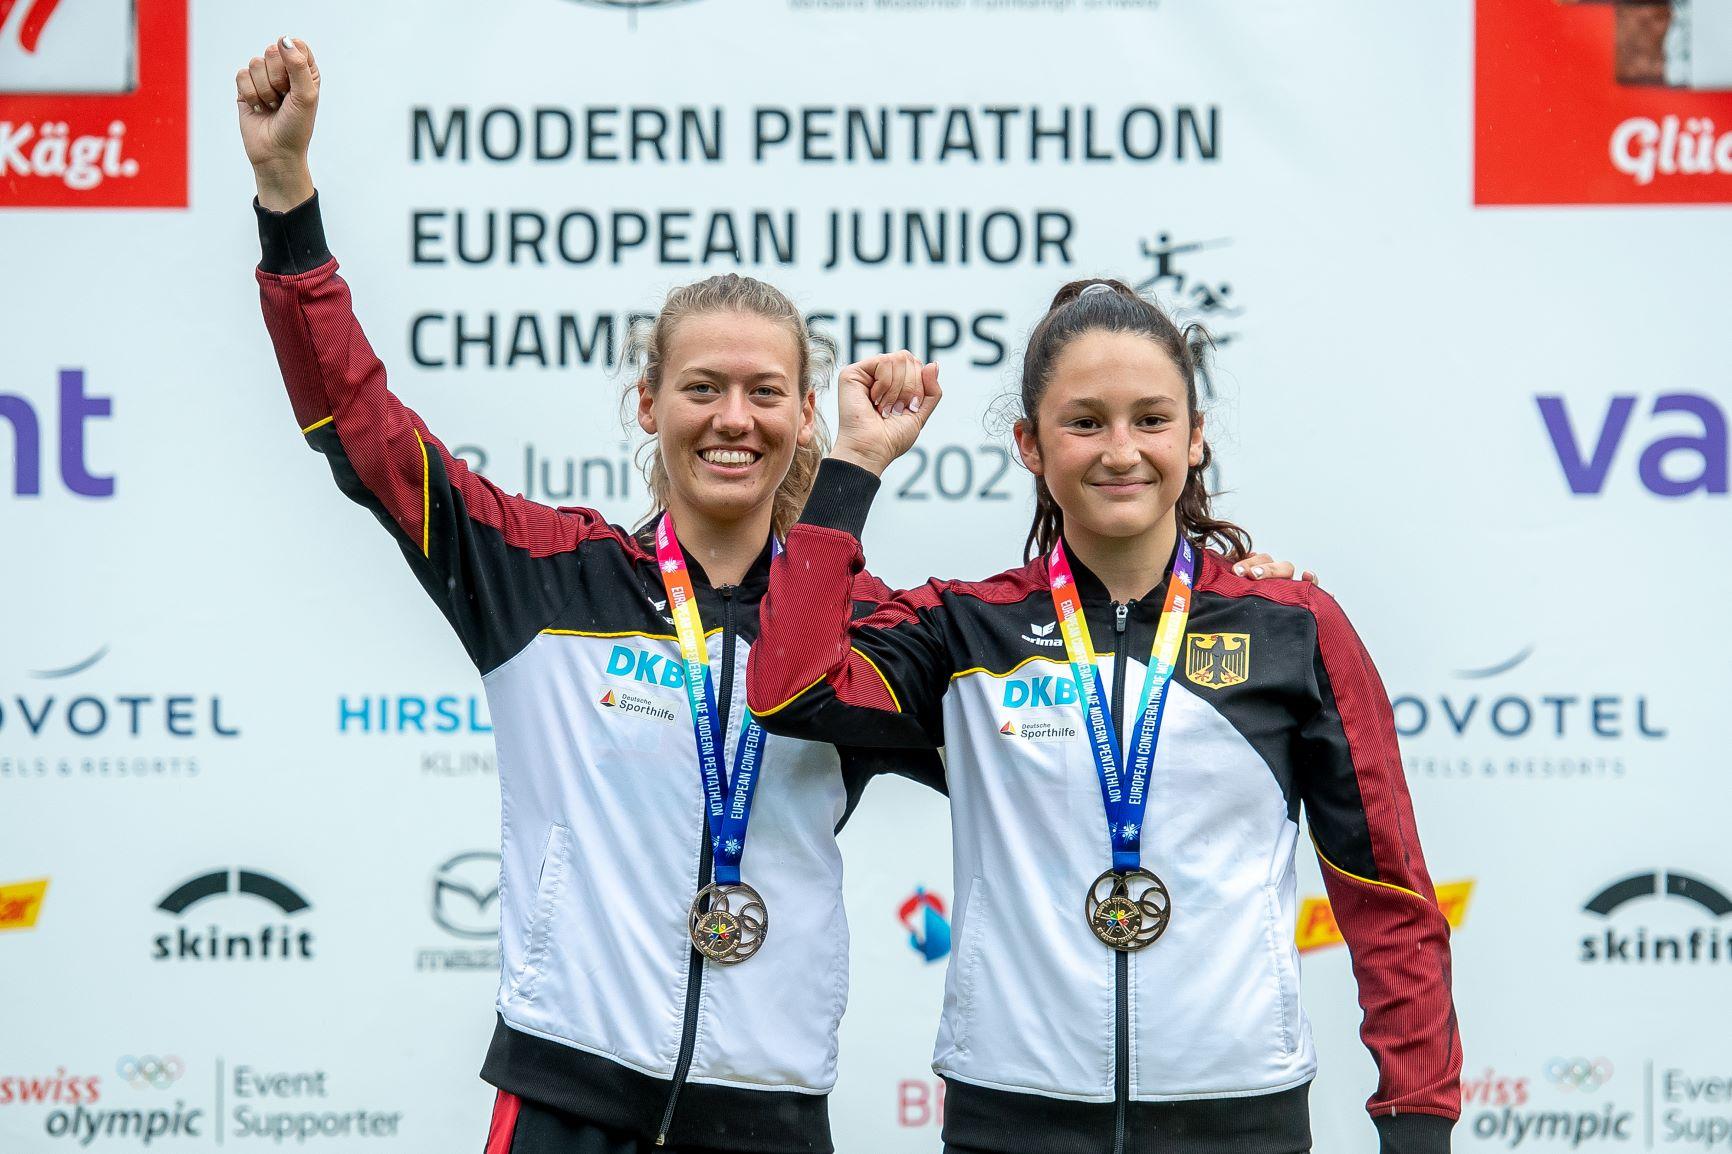 2021 Junior European Championships ECMP Patric Spahni Sieg Frauen-Staffel